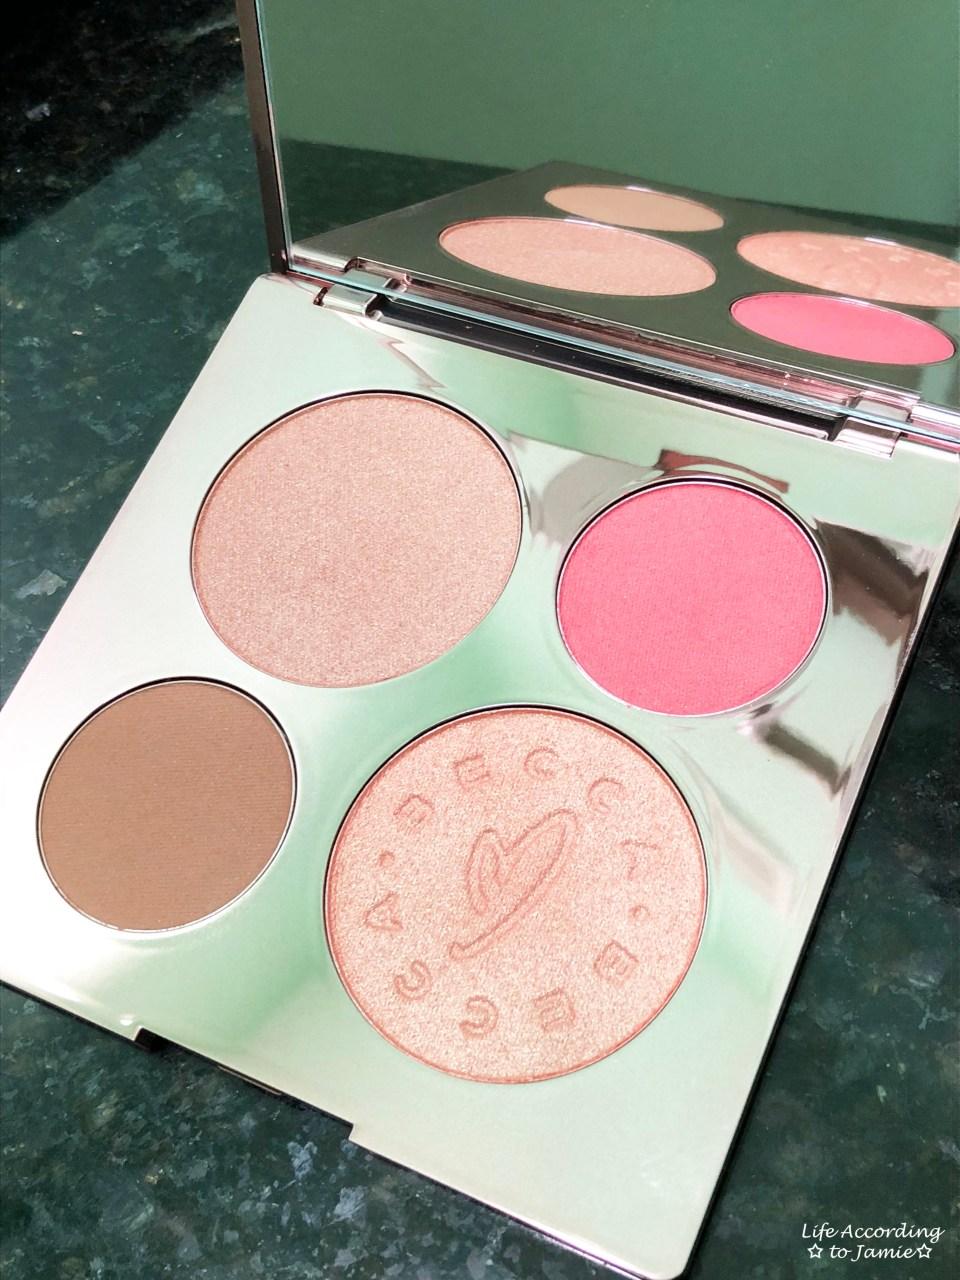 Becca x Chrissy - Glow Face Palette 1